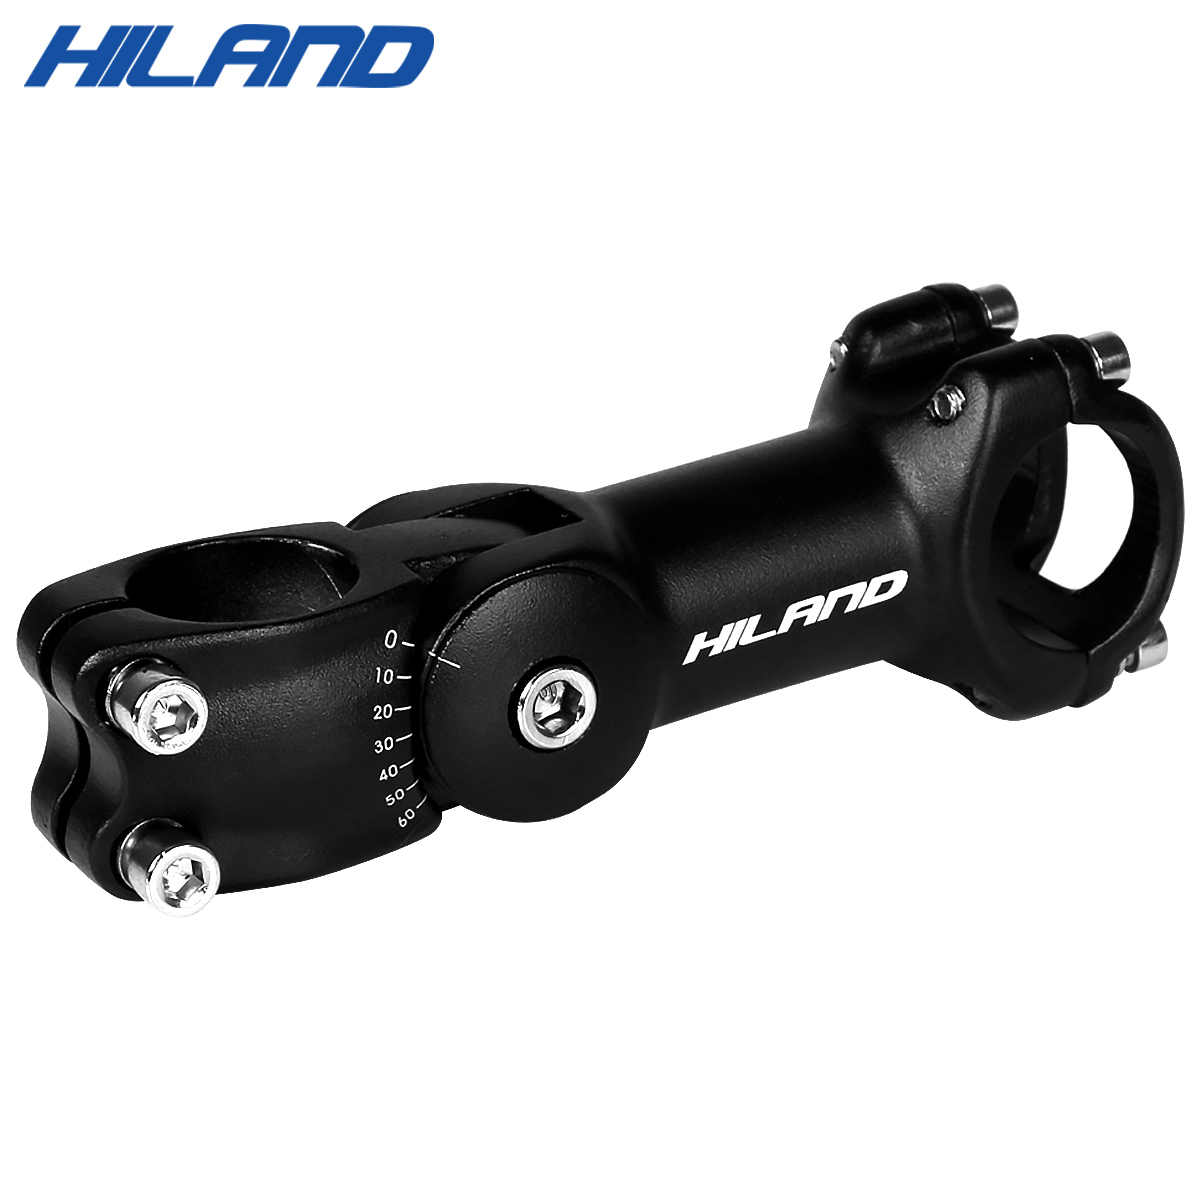 31.8*90//110mm NEW Mountain Road Bike Stem Riser Adjustable MTB Bicycle Handlebar